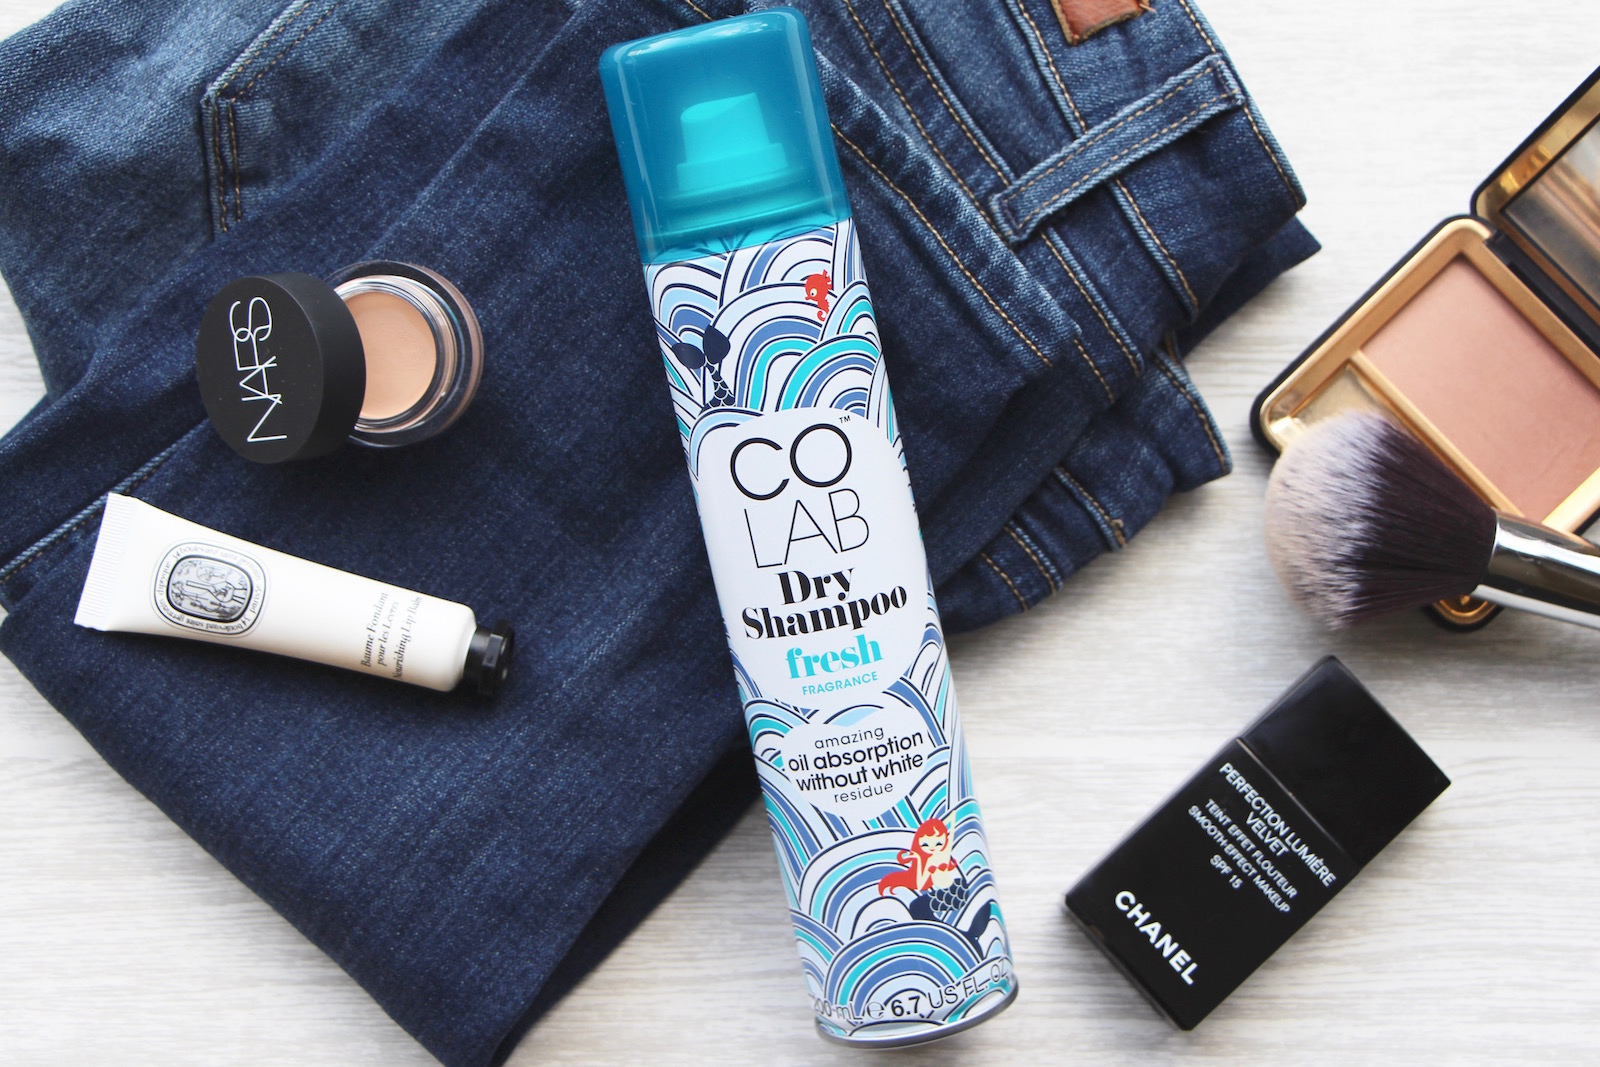 colab dry shampoo fresh monaco scent